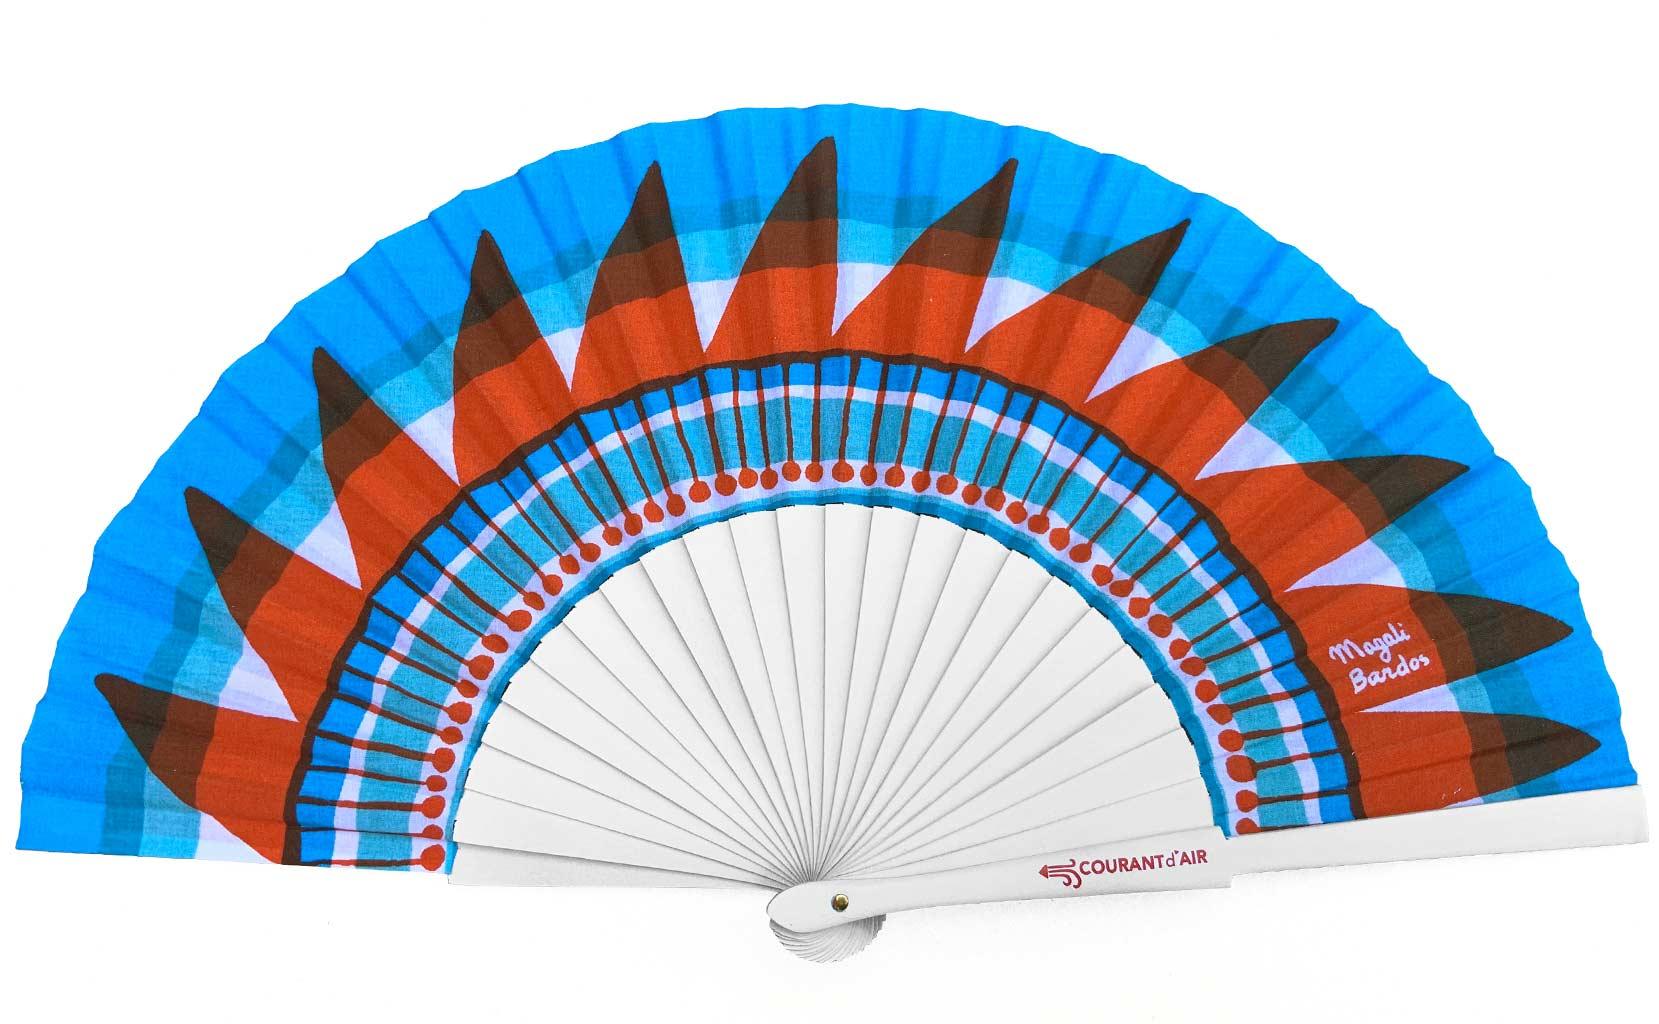 Sunscreen ©courant d'air © Magali Bardos éventail handfan motif pattern sérigraphie sur tissus silkscreen bleu rouge blanc iroquois soleil